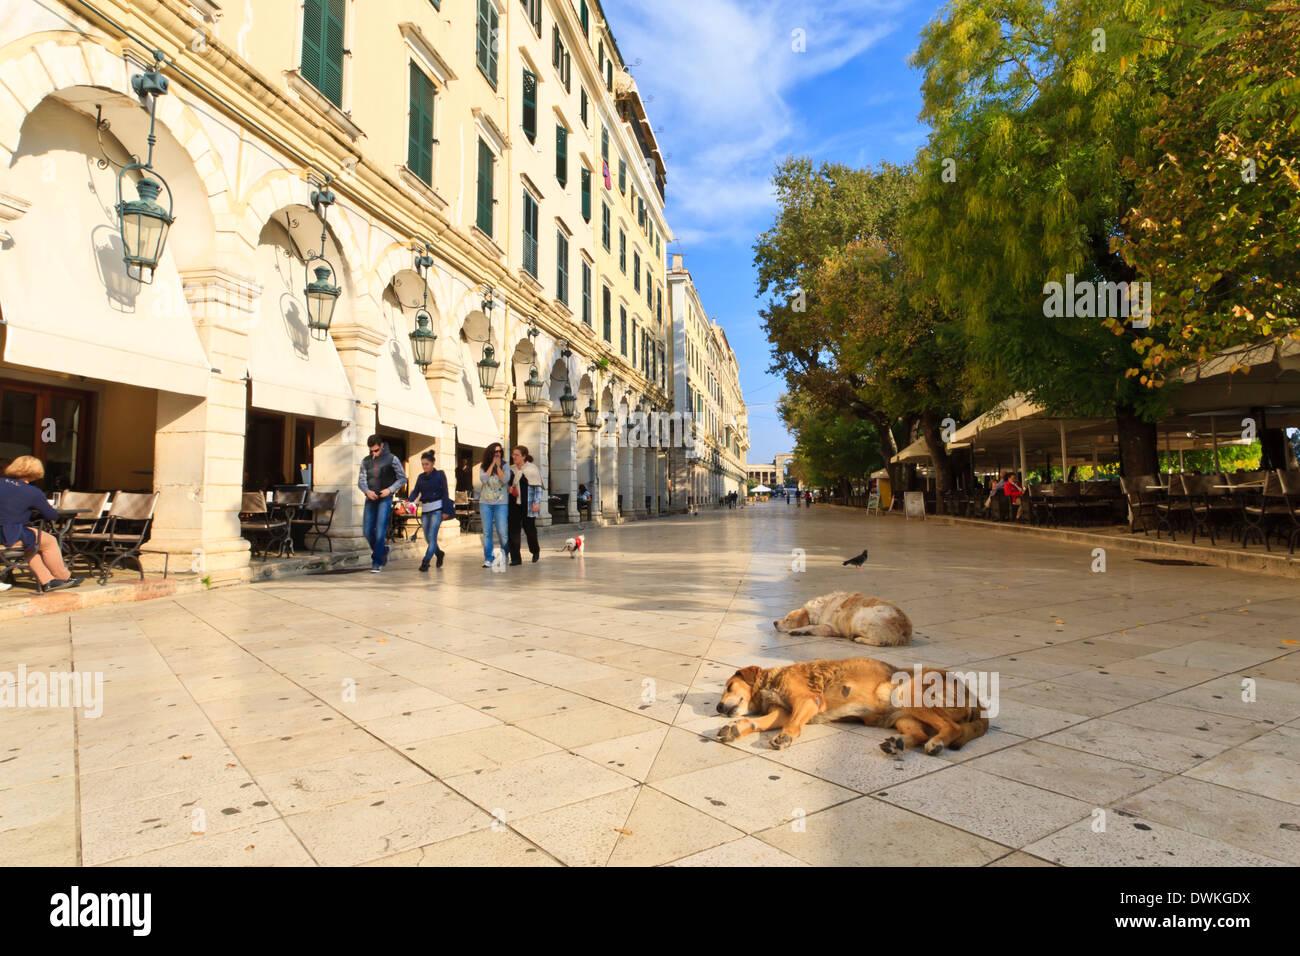 Residents and sleeping dogs, The Liston, Corfu Town, Corfu, Ionian Islands, Greek Islands, Greece, Europe Stock Photo